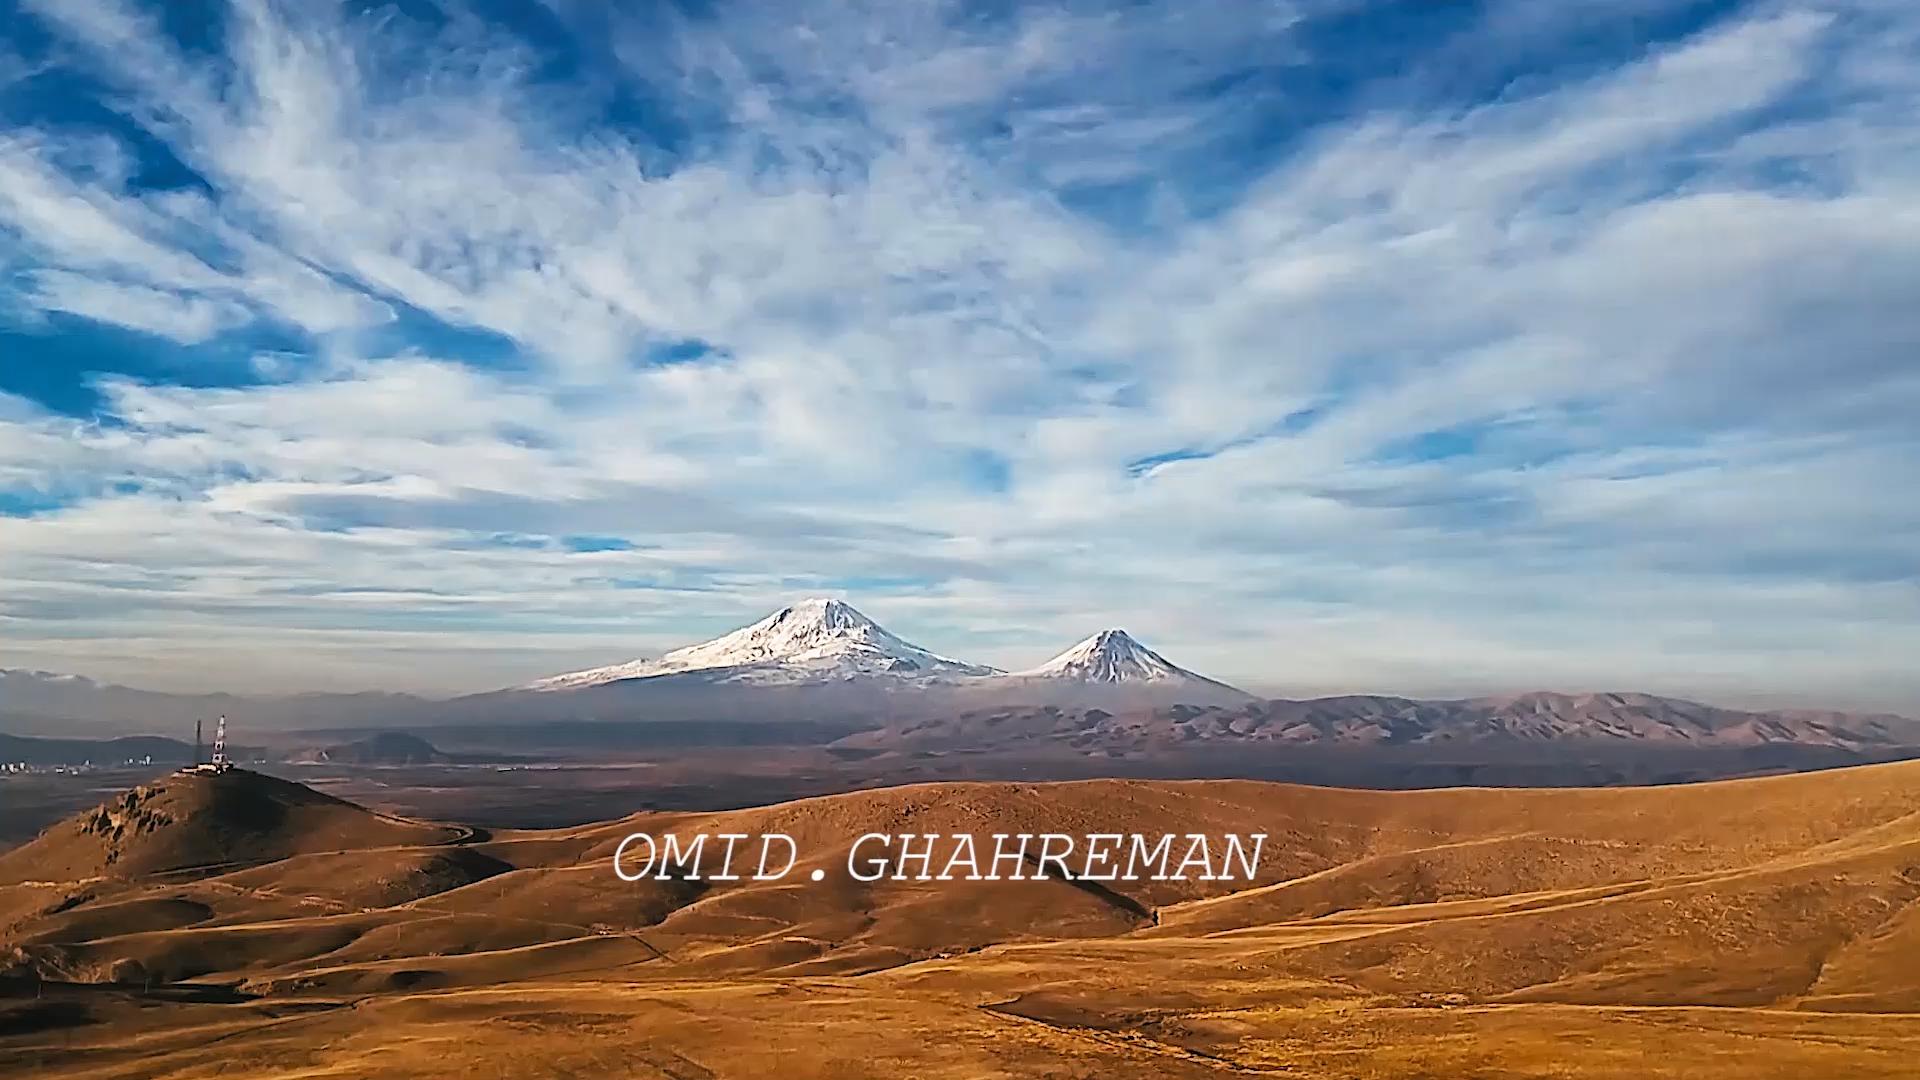 Ararat mountain From maku by omid ghahreman کوه آرارات از شهر سنگی ماکو توسط : امیدرضا قهرمانزاده